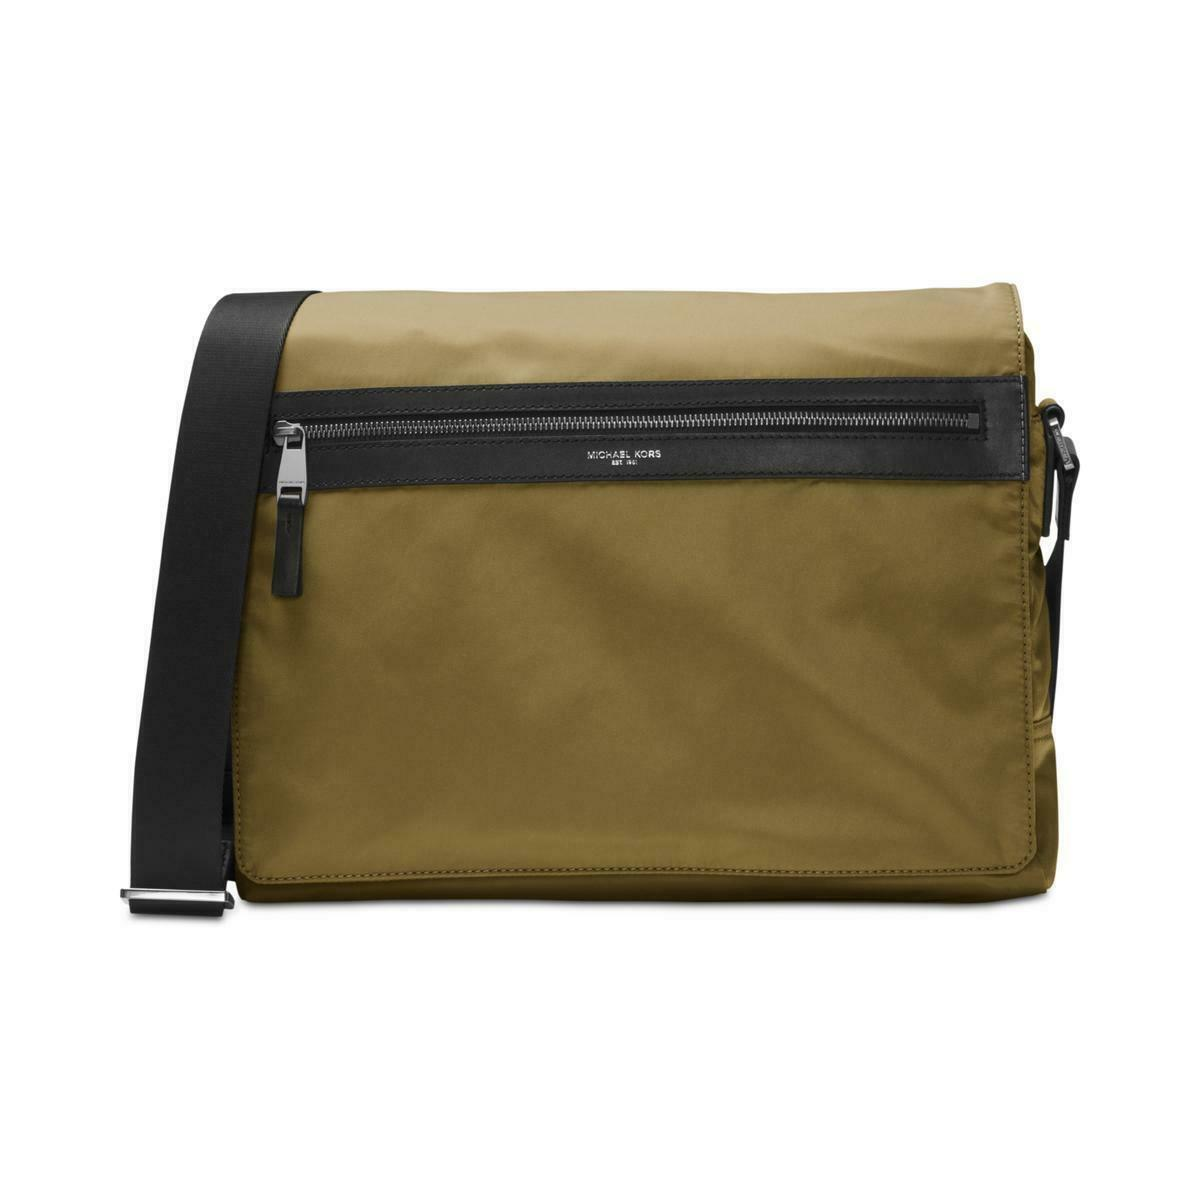 46d4d1e0acff Michael Kors Green Messenger shoulder Bag Men 100 Auth Kent Military L17  for sale online